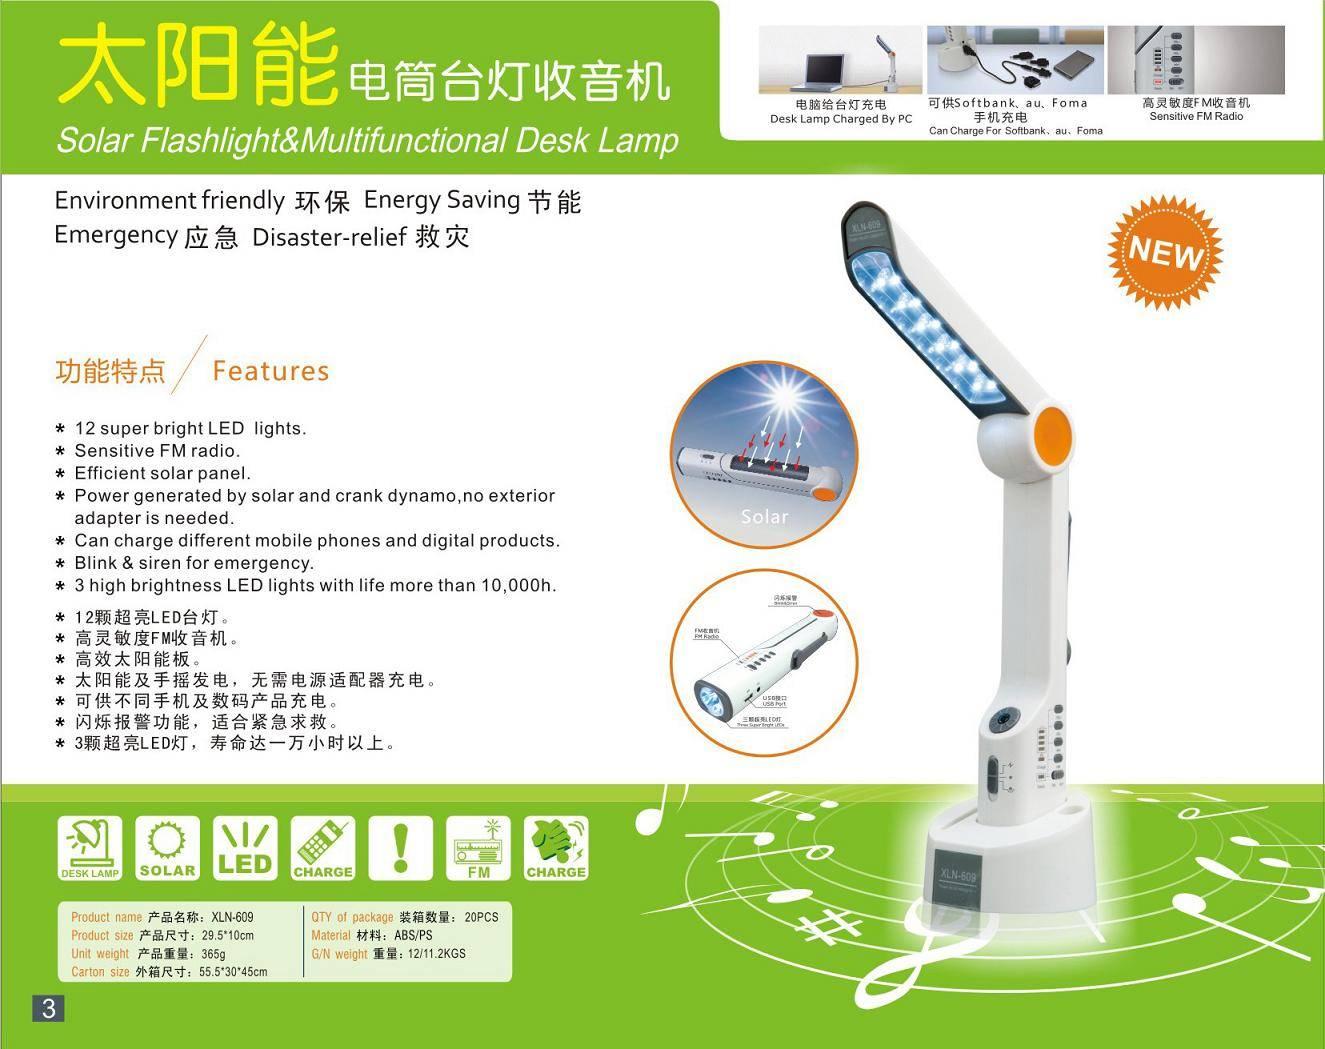 Solar multifunctional dest lamp radio